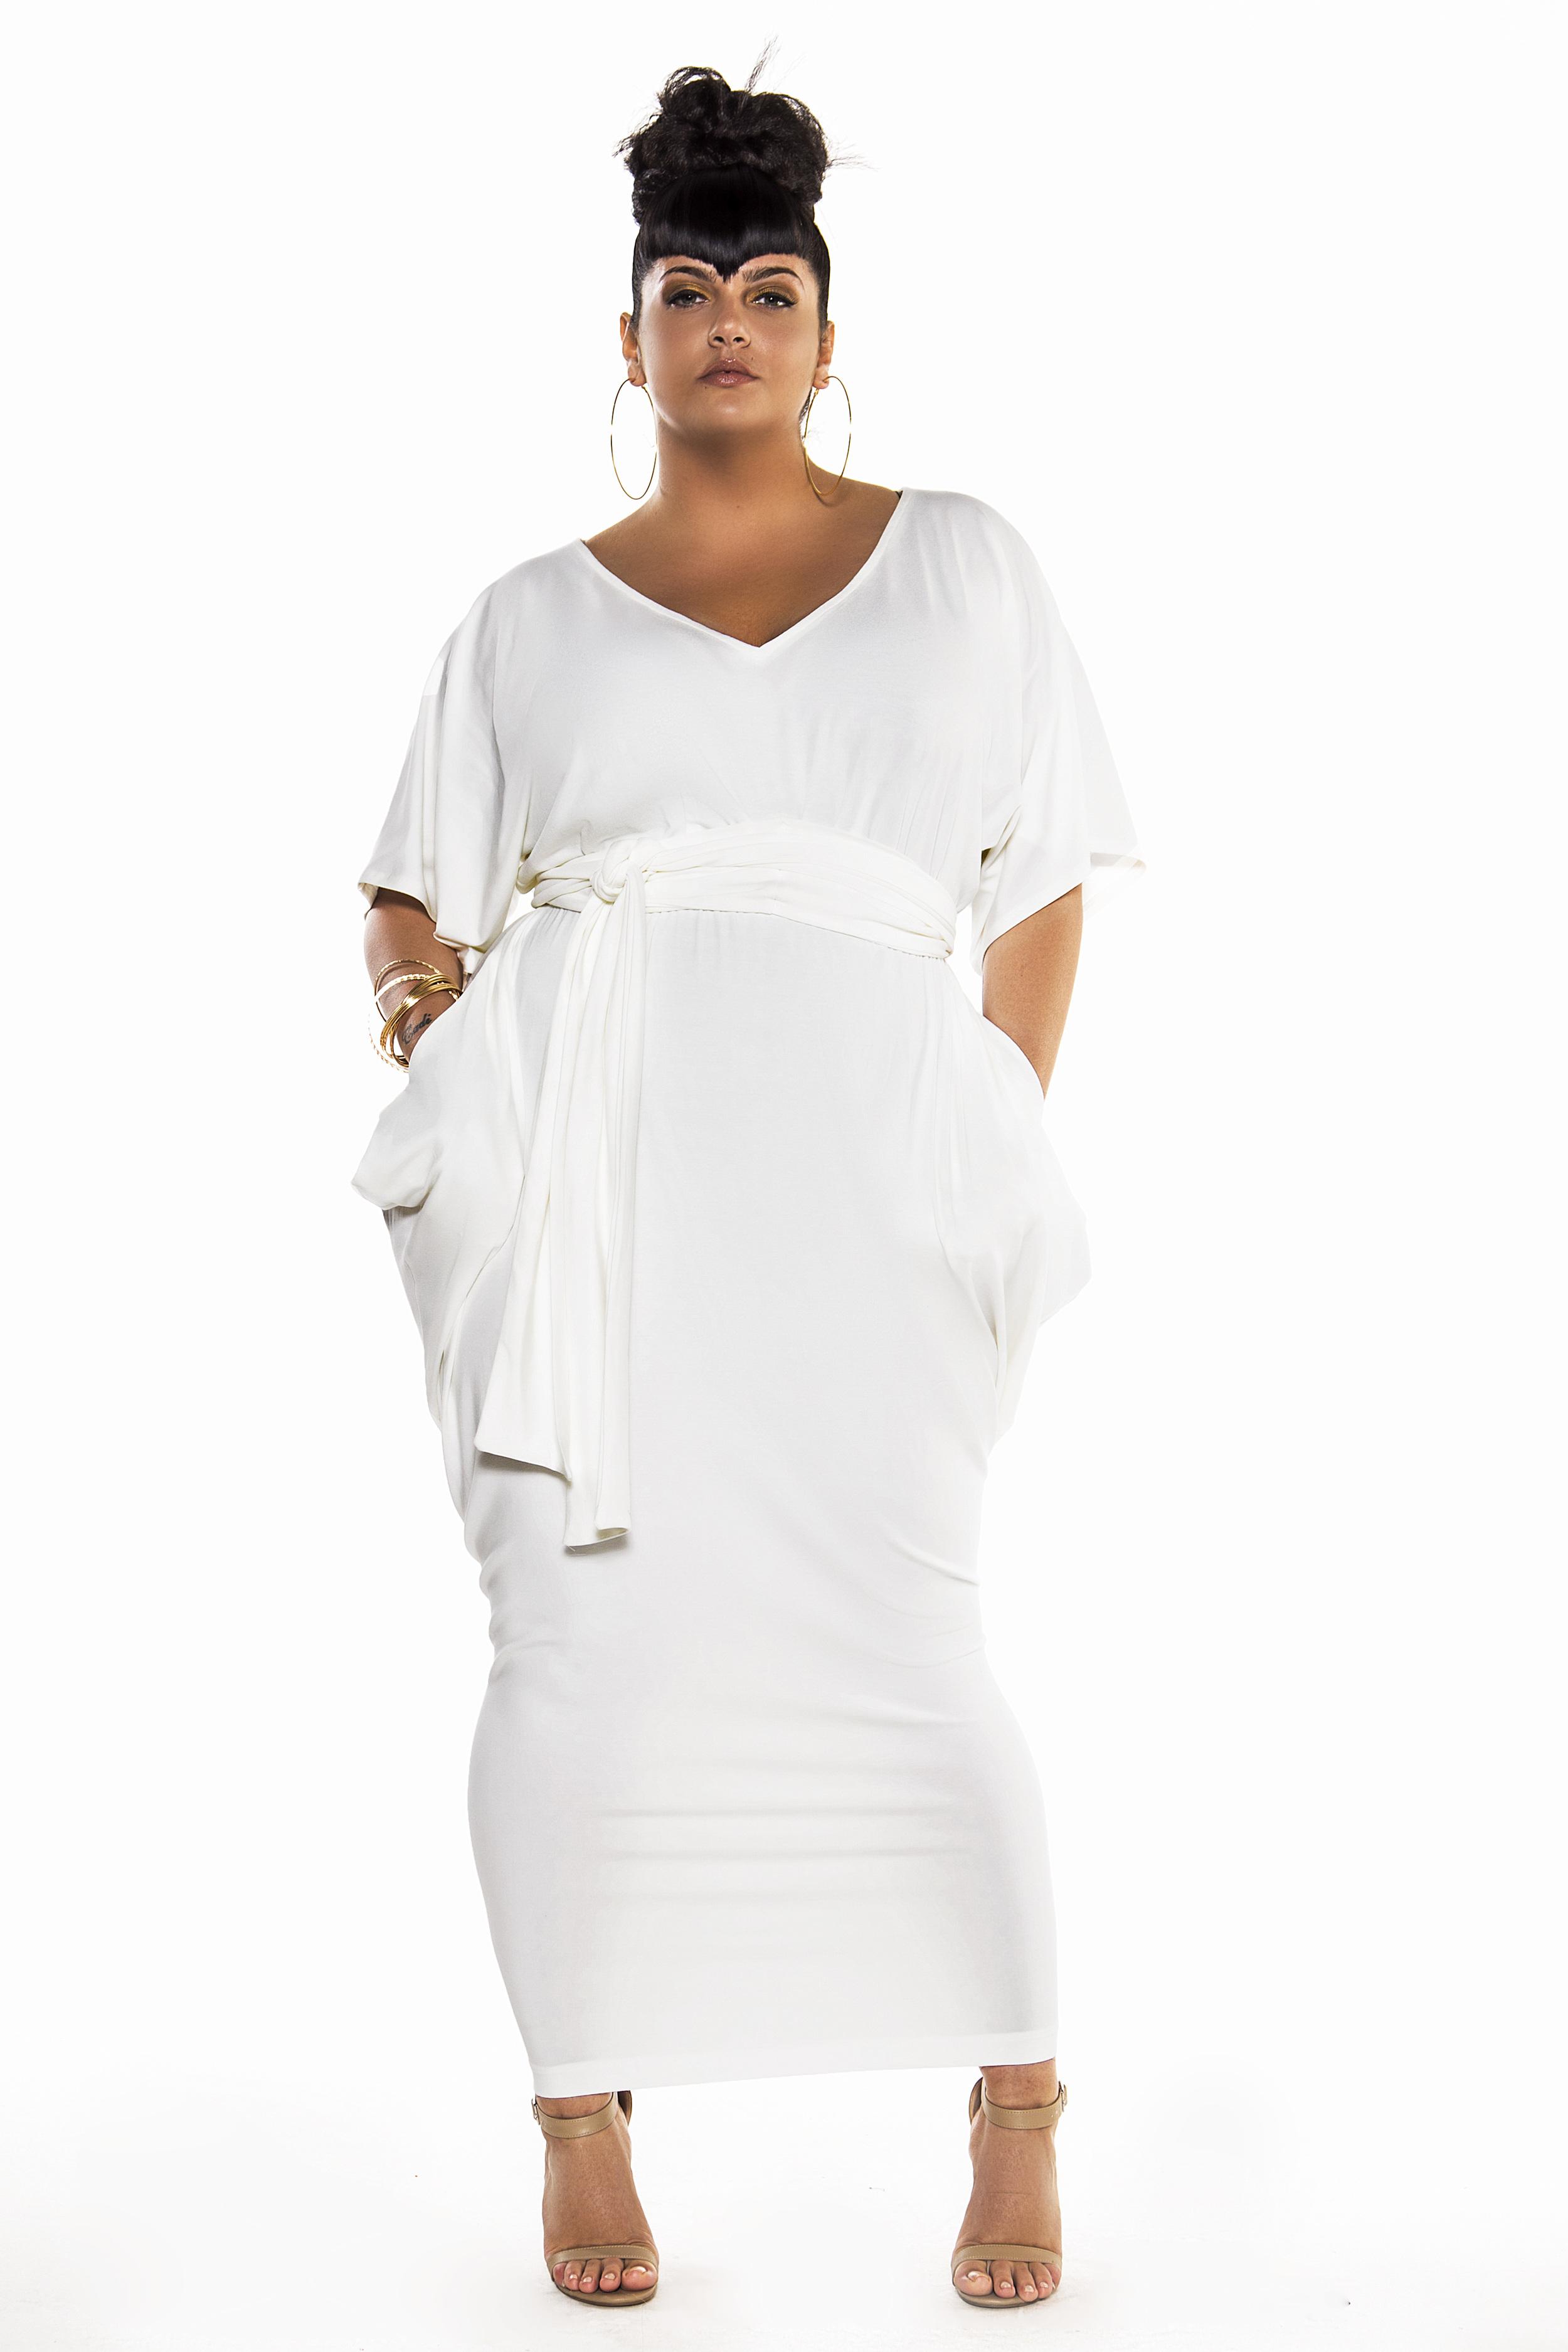 JIBRI Bat Sleeved Slouch V Neck Maxi Dress — JIBRI